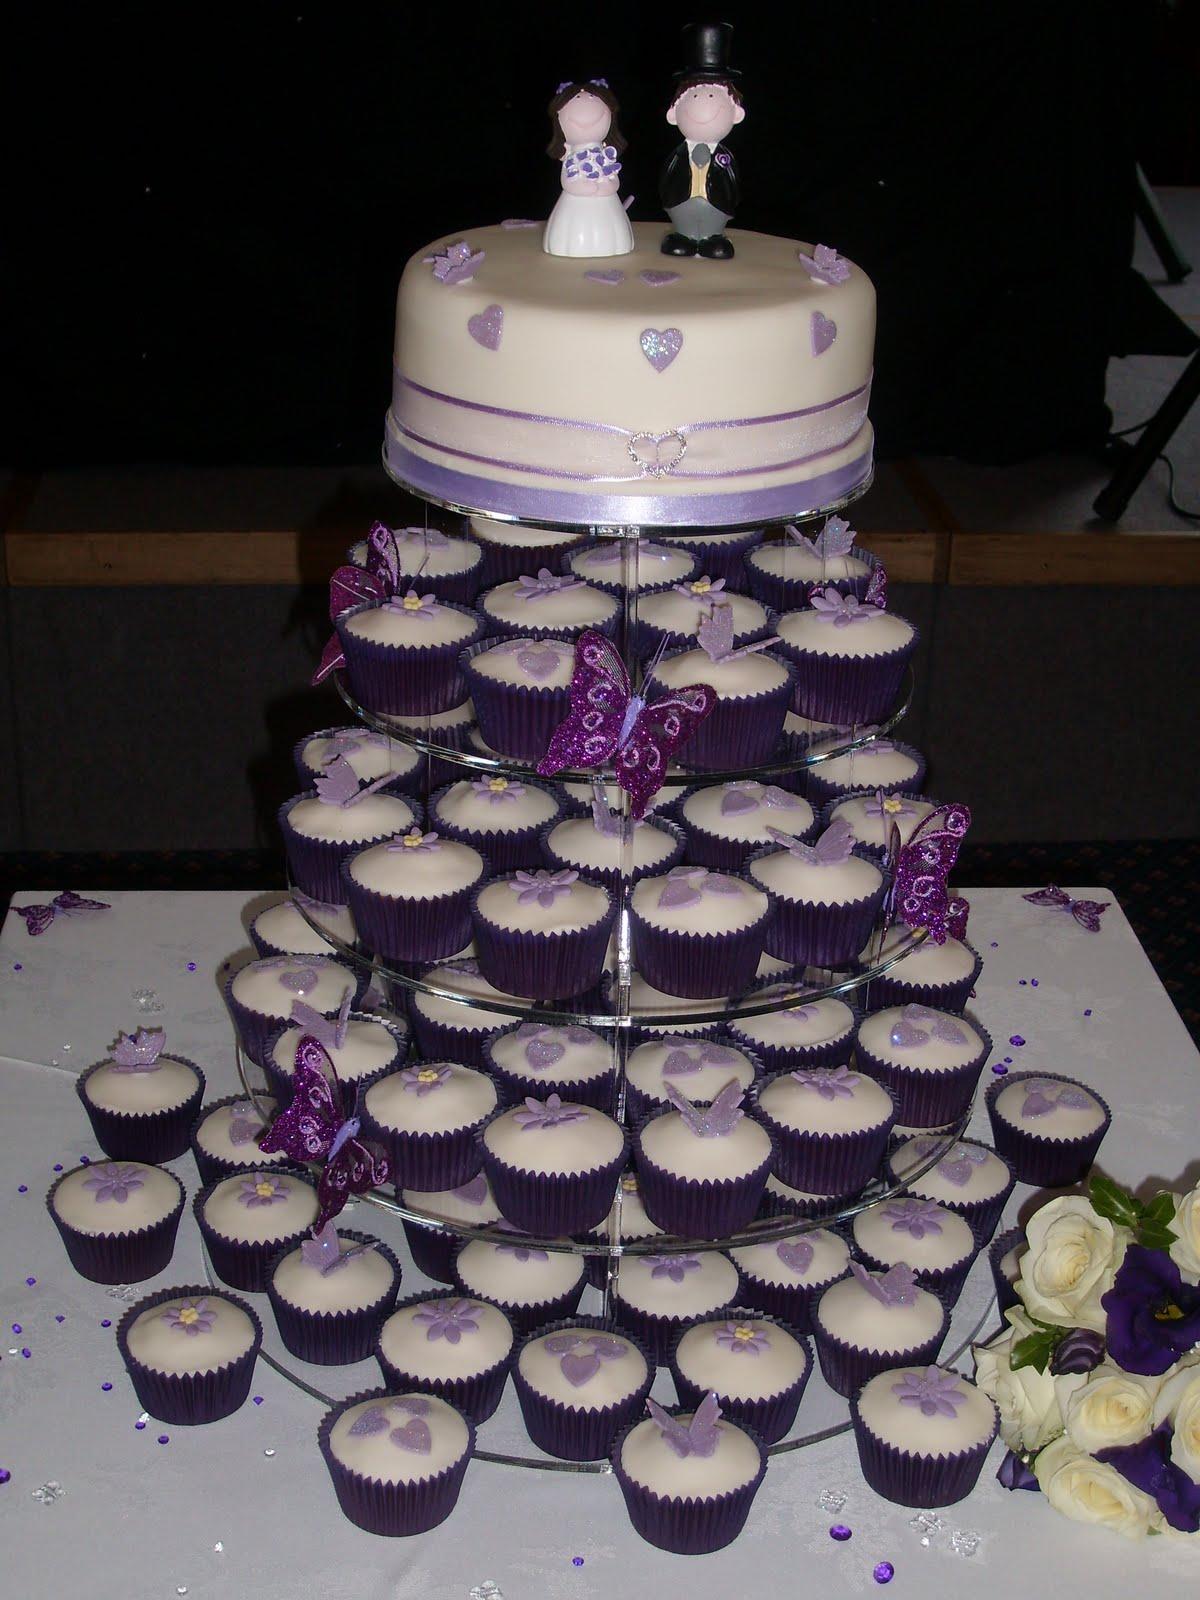 Teeny Cupcakes Wedding Cakes